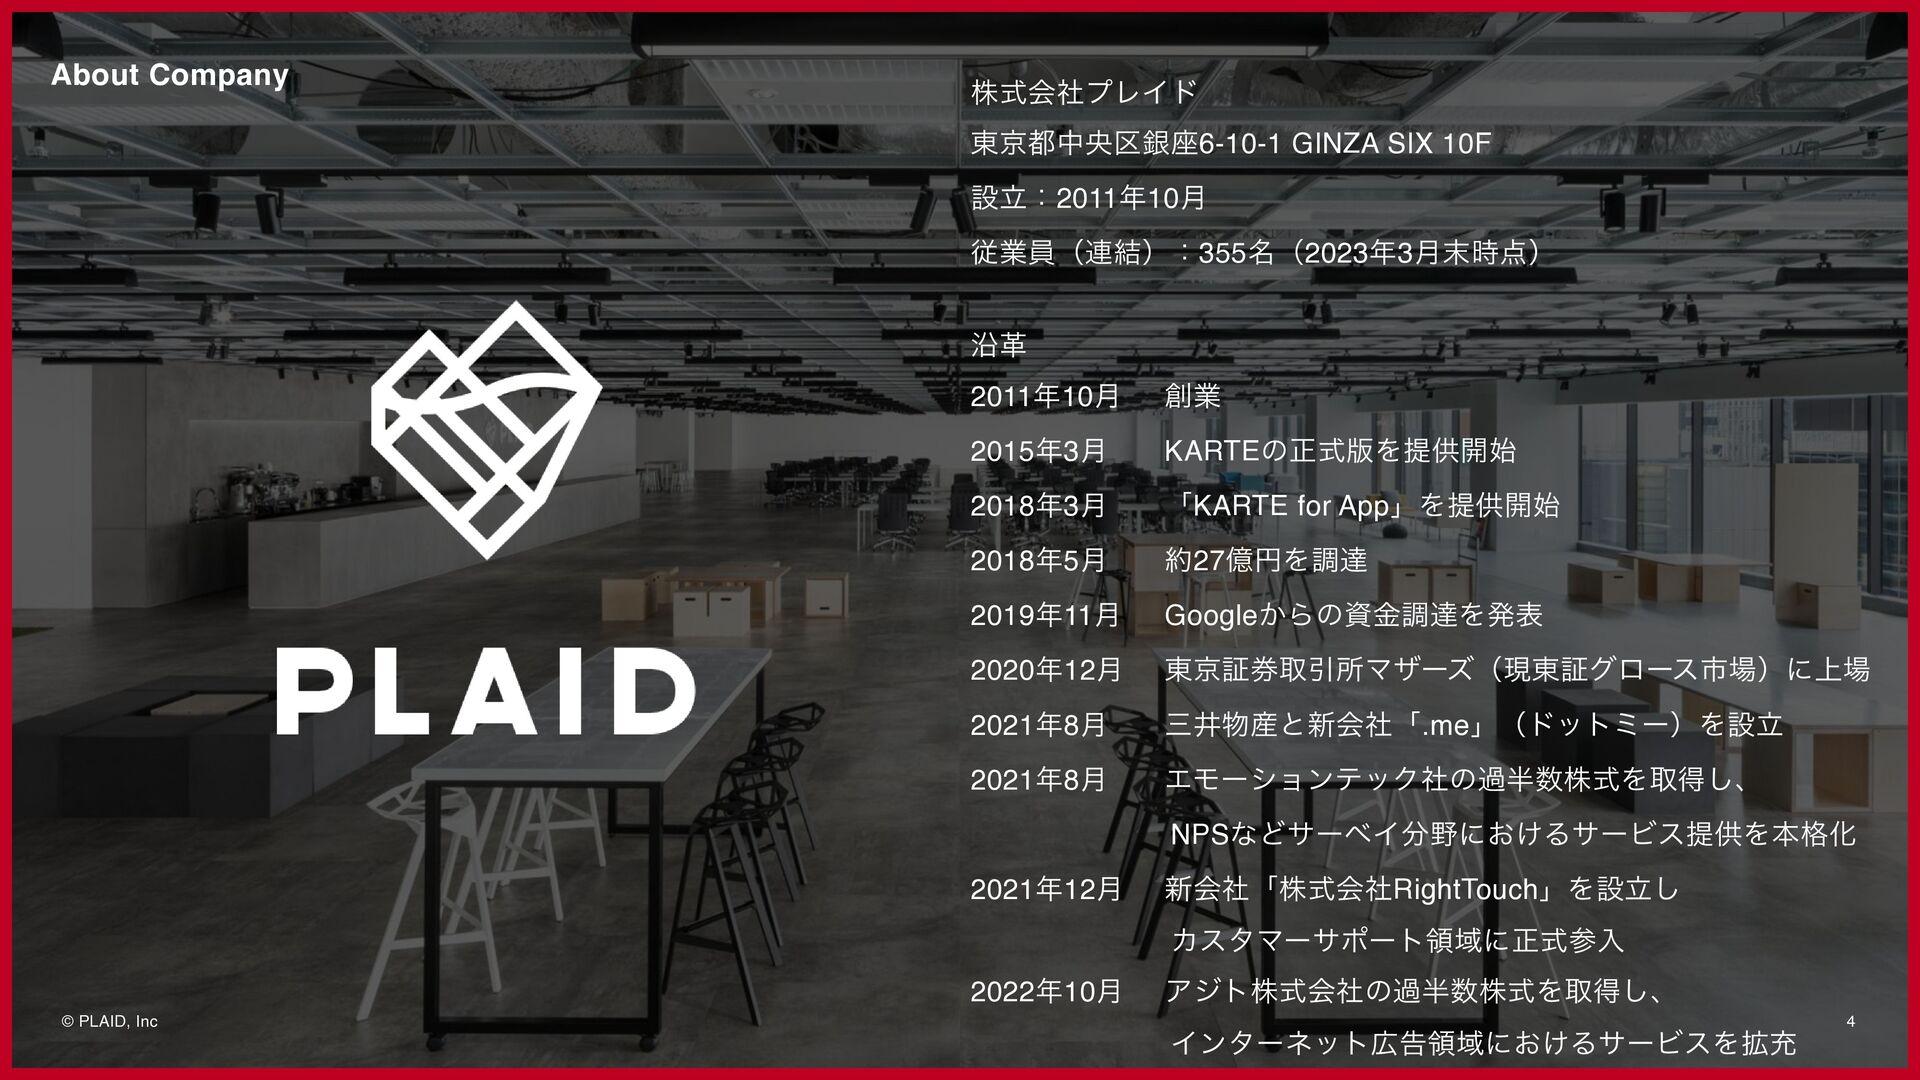 4 About Company © PLAID, Inc 株式会社プレイド 東京都中央区銀座6...